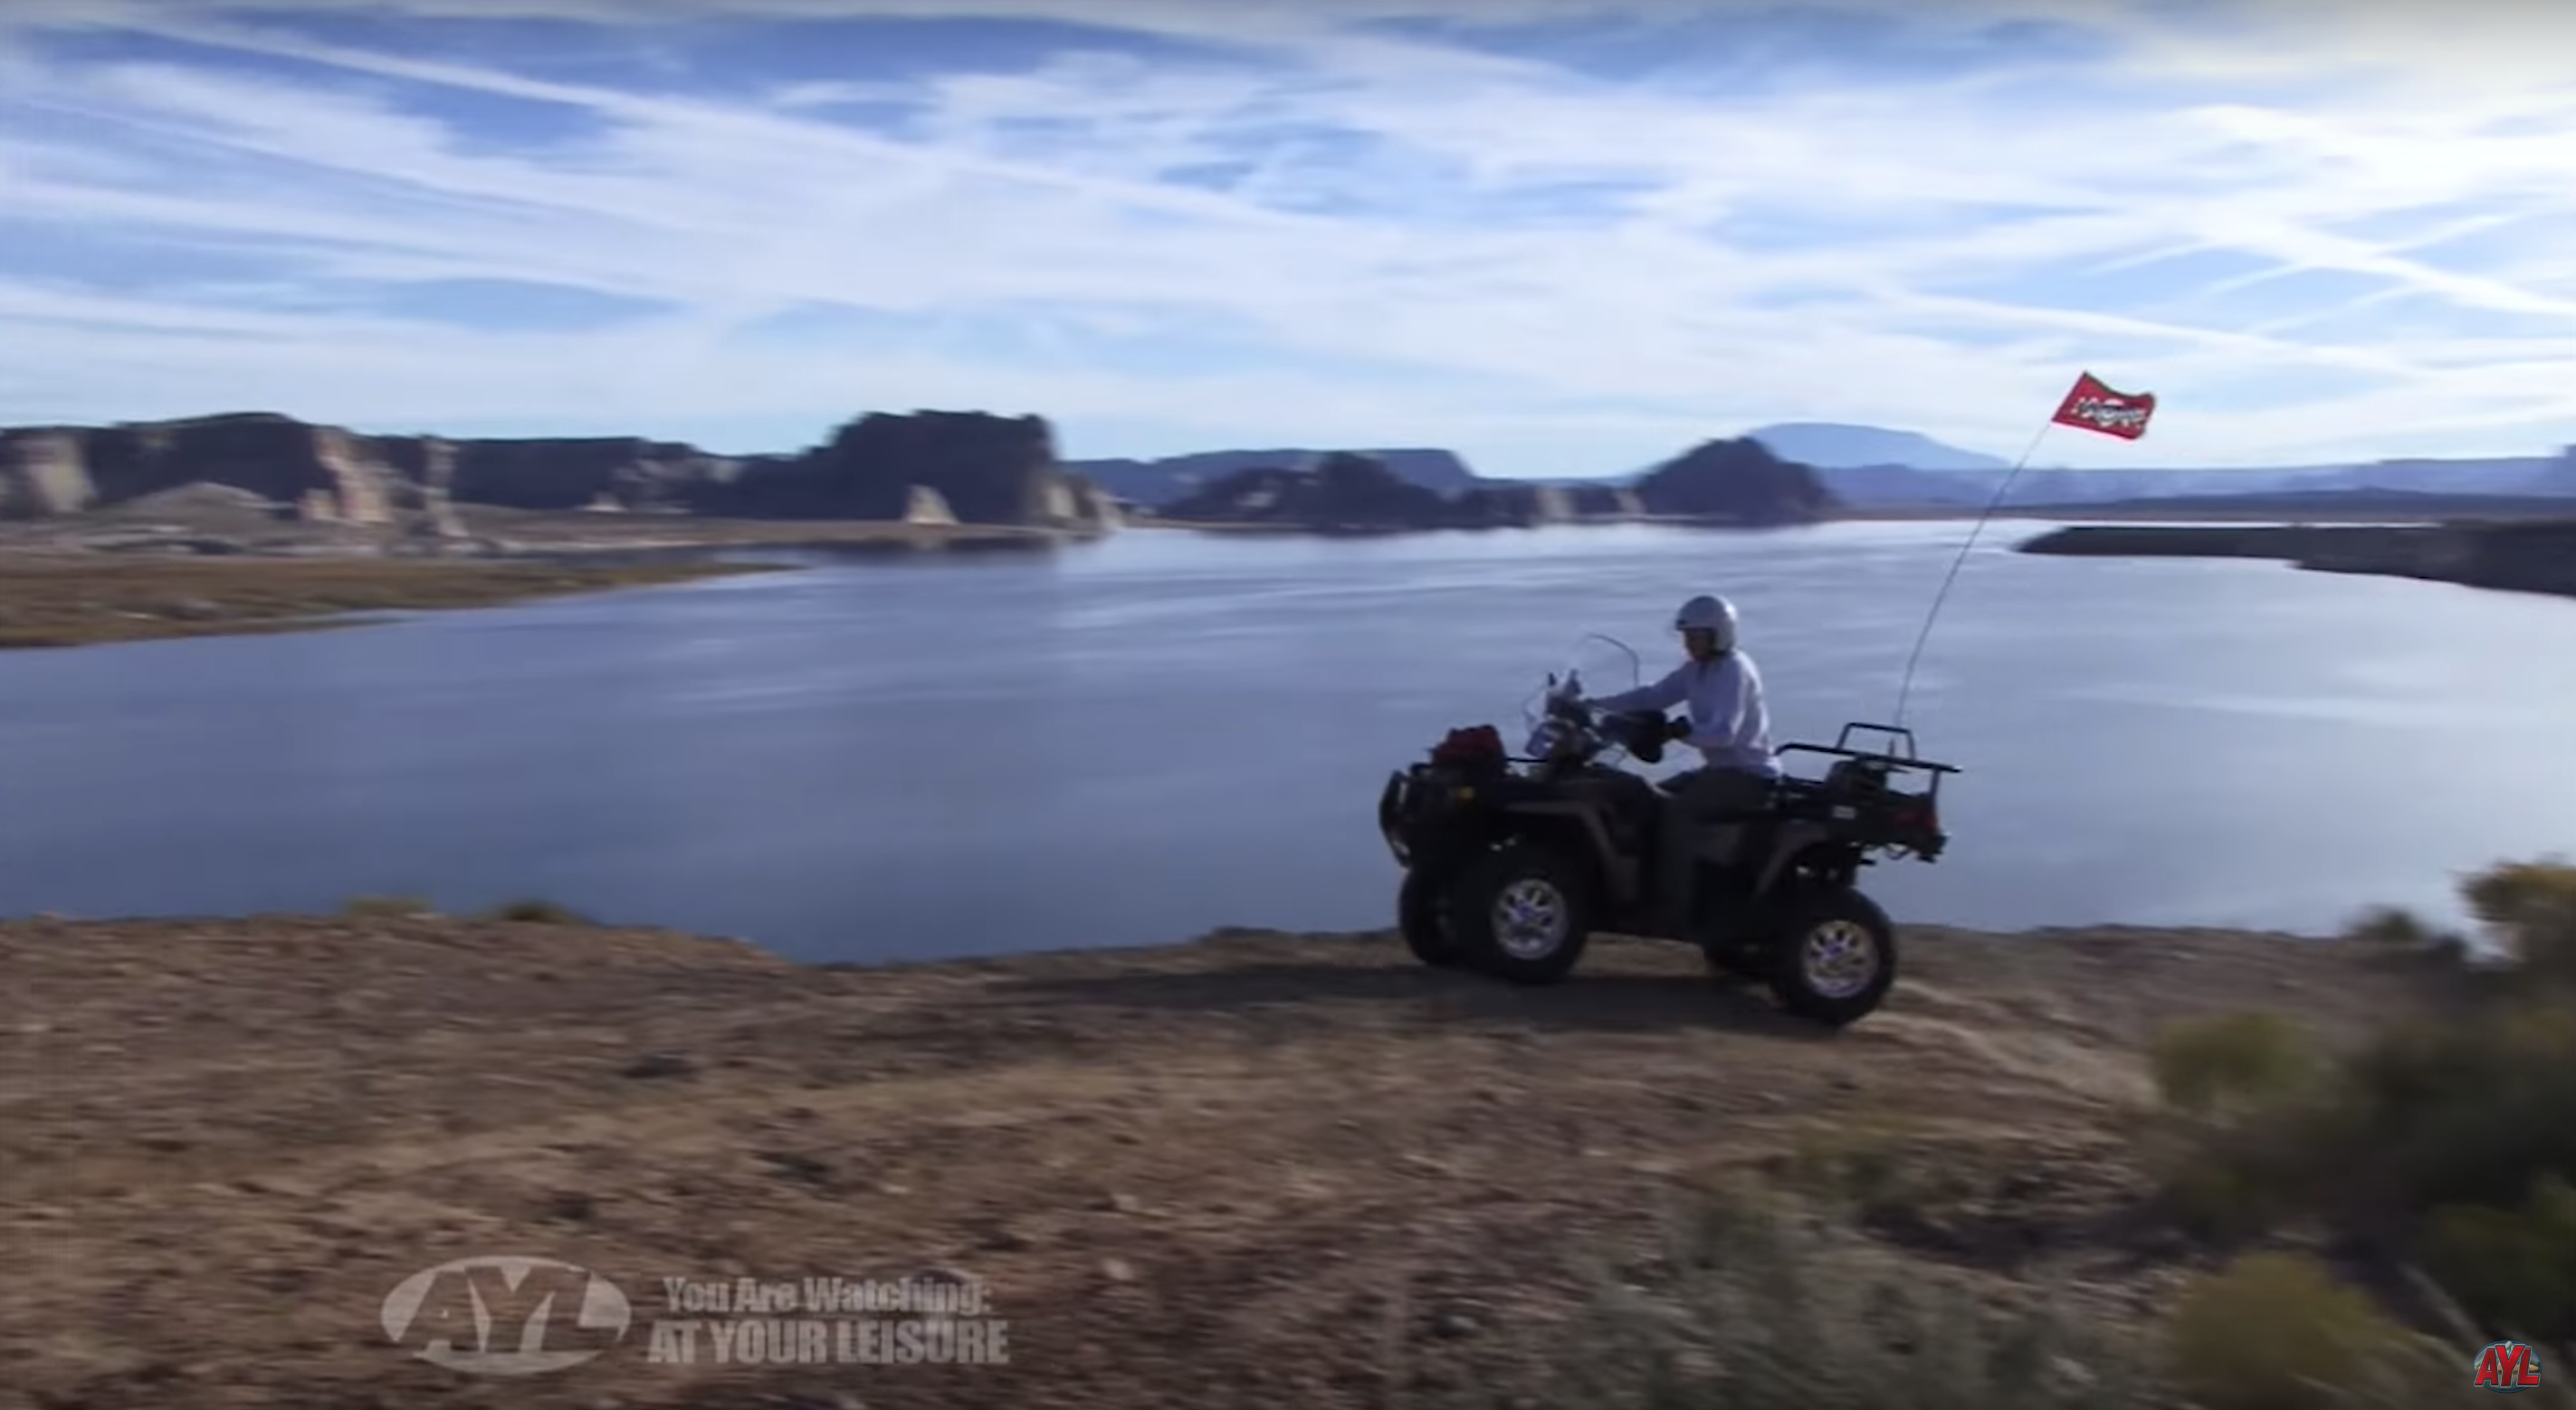 Transcontinental Railroad – Salt Lake Hiking – Land Use Scoping